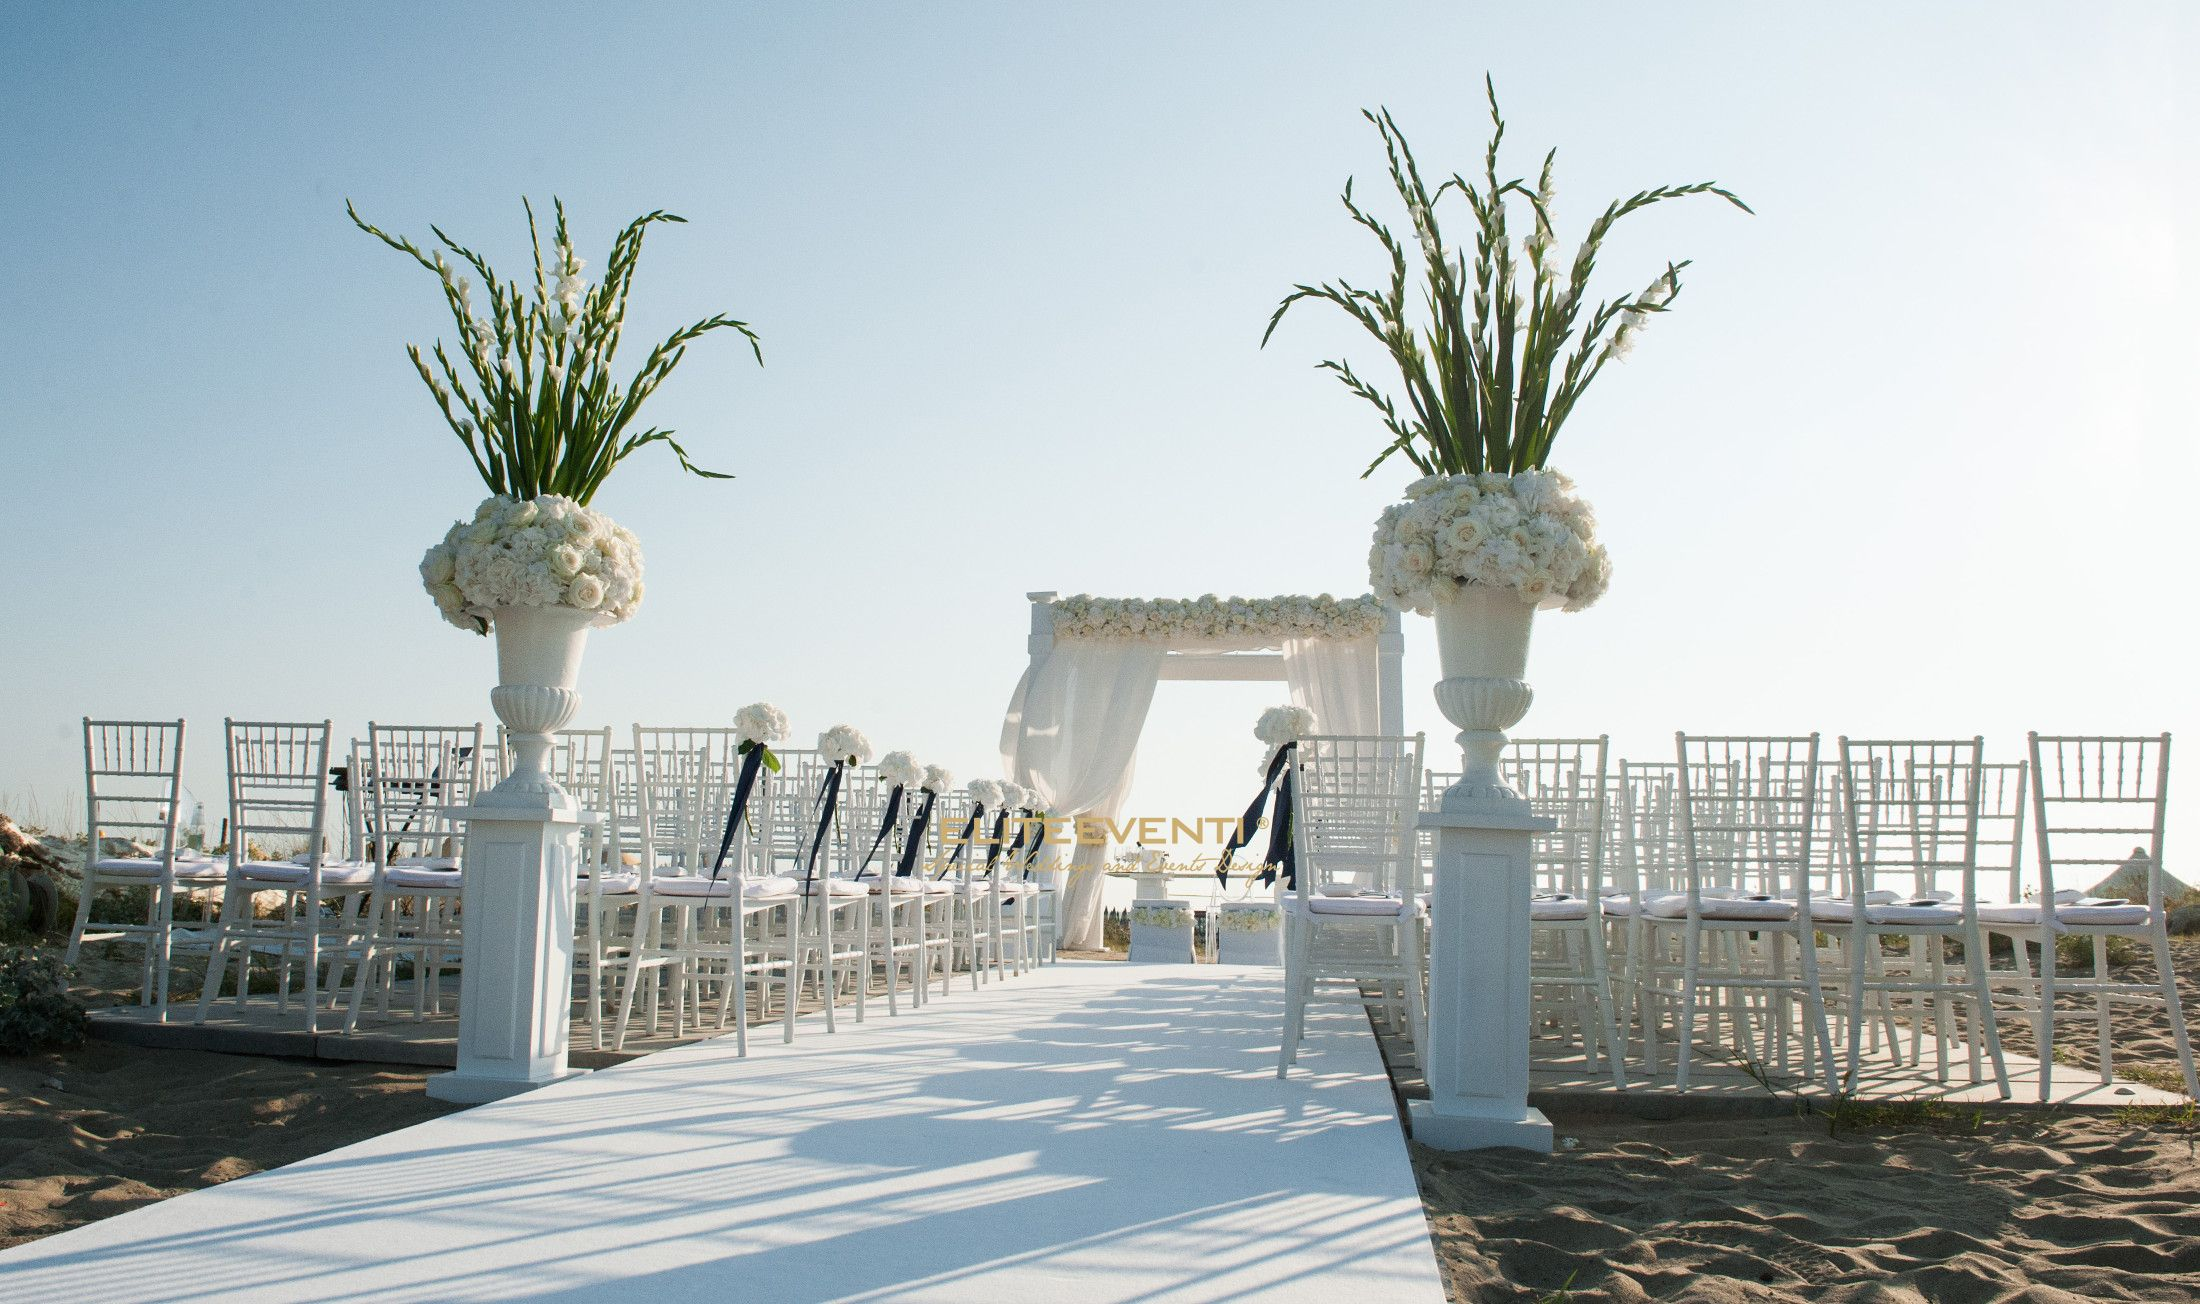 1 cerimonia esclusiva in spiaggia